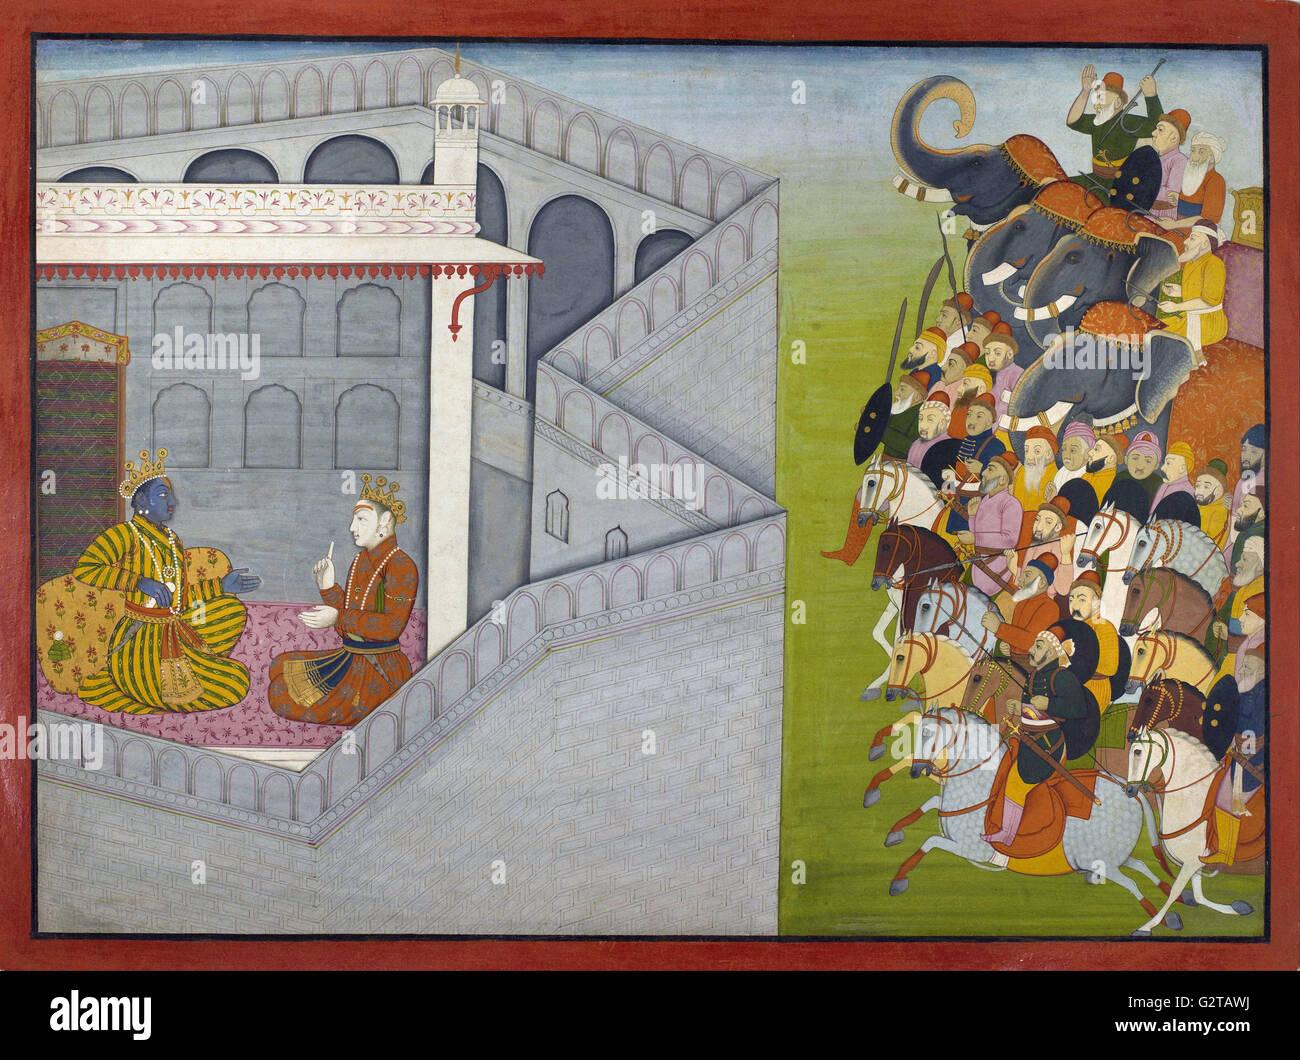 Attributed to Fattu - The Siege of Mathura by Jarasandha from the series Guler-Basholi - - Stock Image